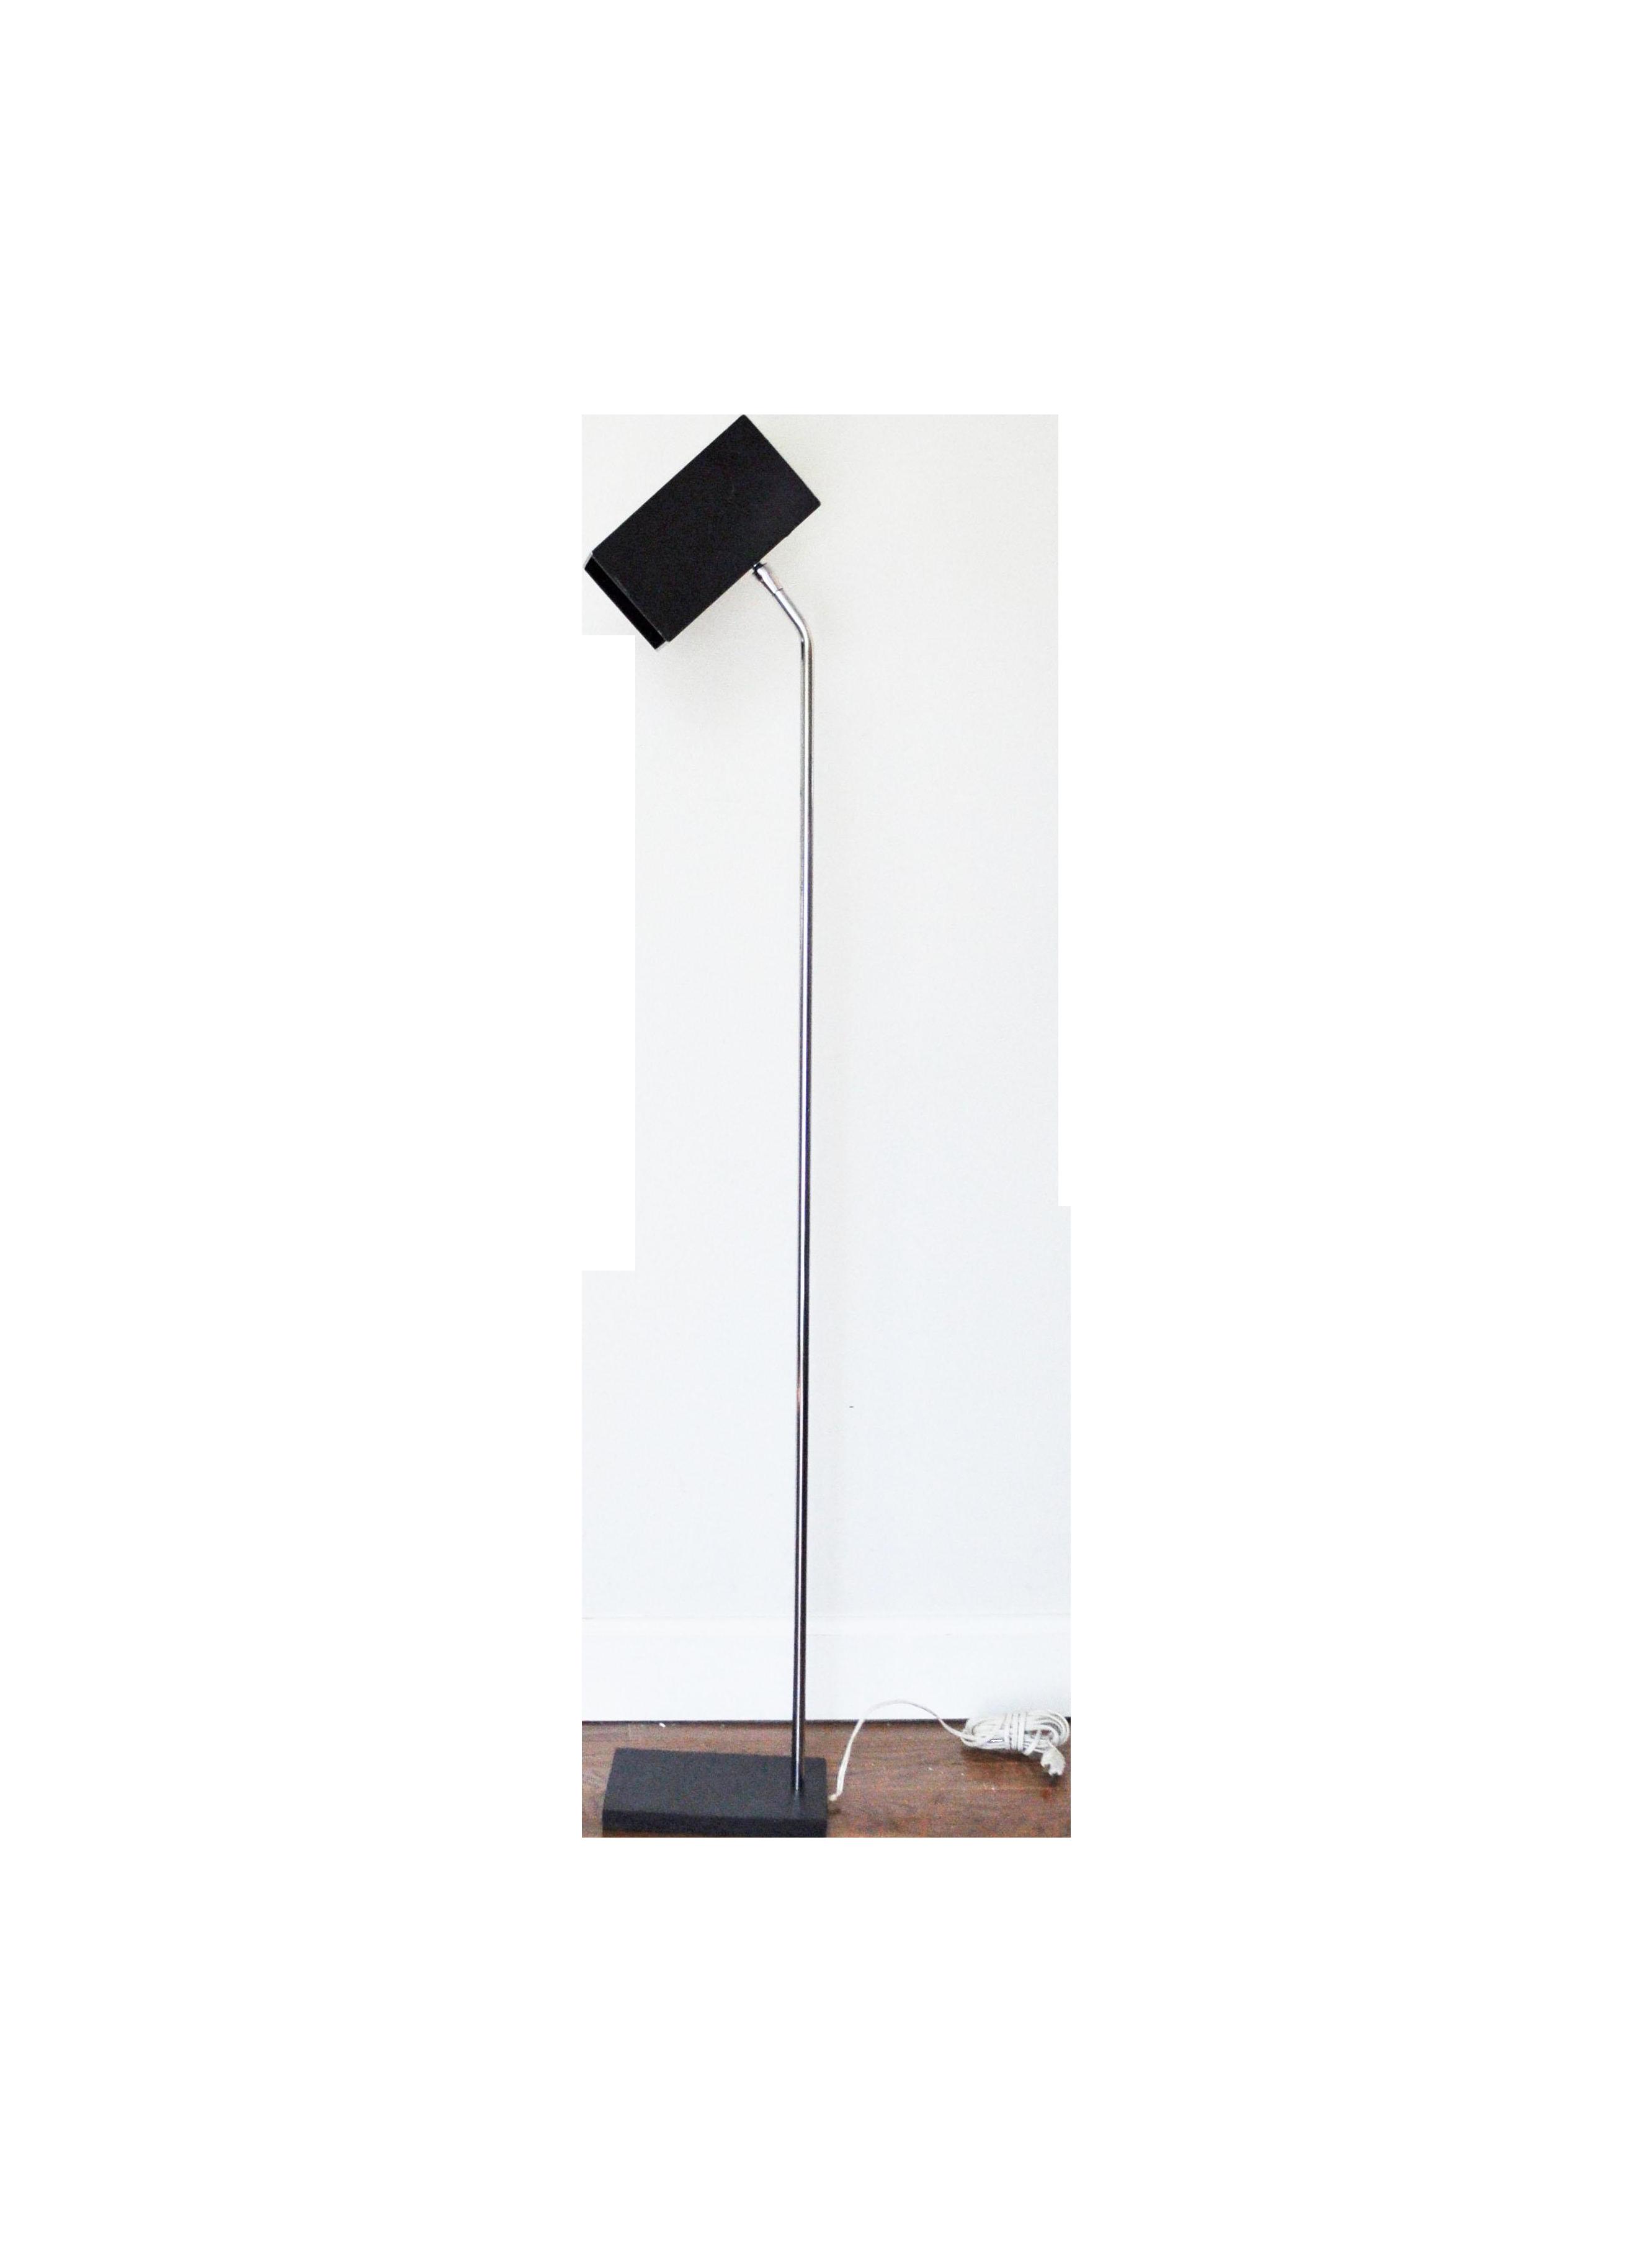 Mcm Floor Lamp Robert Sonneman For George Kovacs Floor Lamp Lamp Sonneman